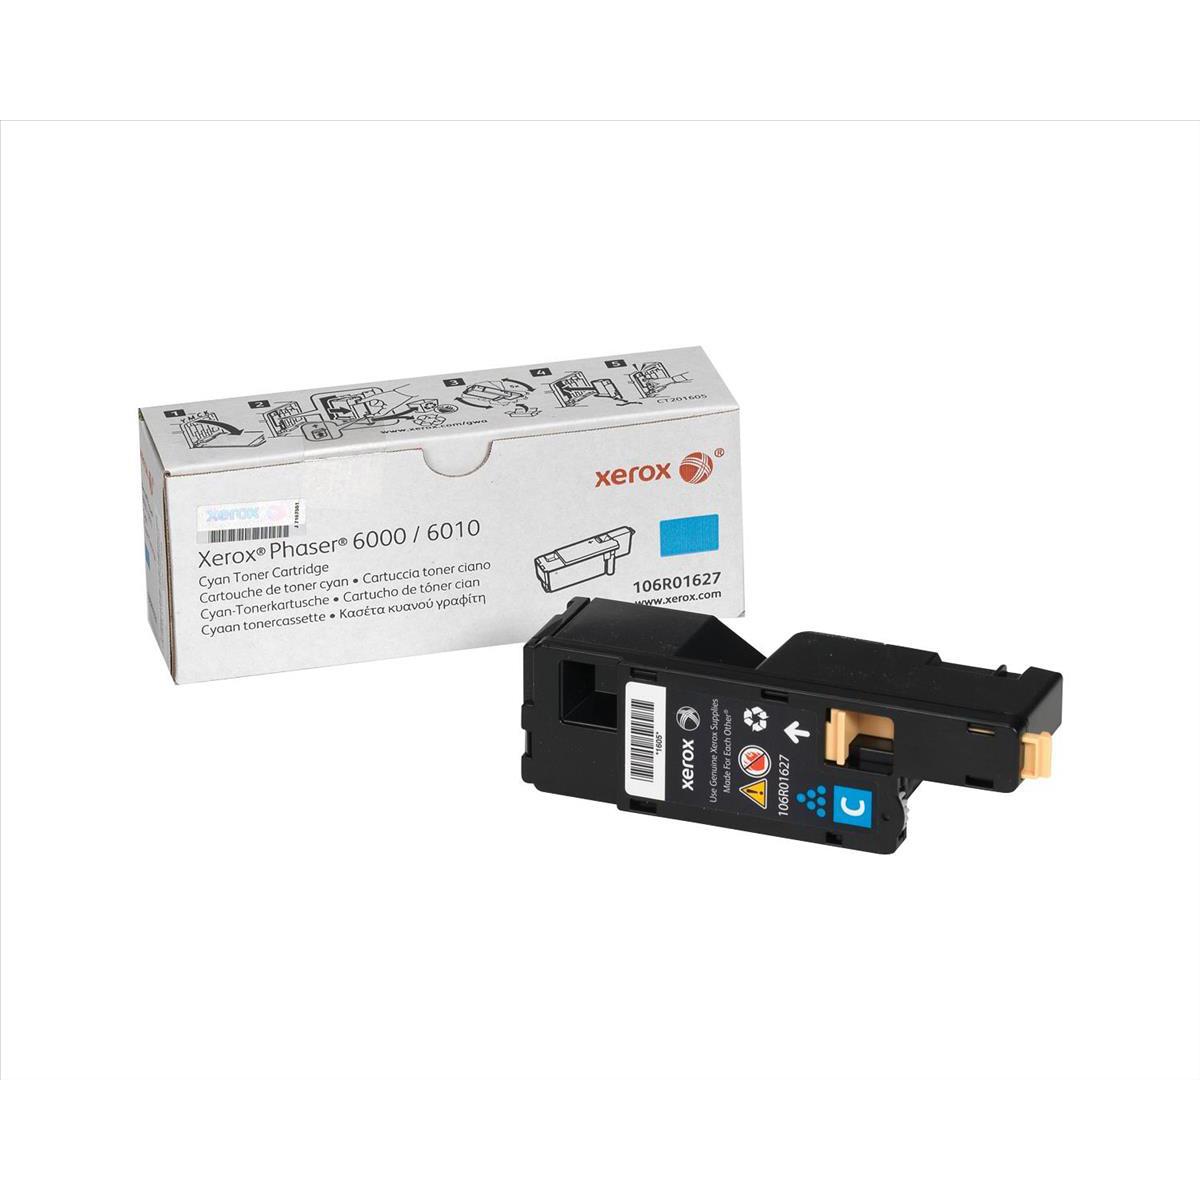 Xerox Phaser 6000 Laser Toner Cartridge Page Life 1000pp Cyan Ref 106R01627